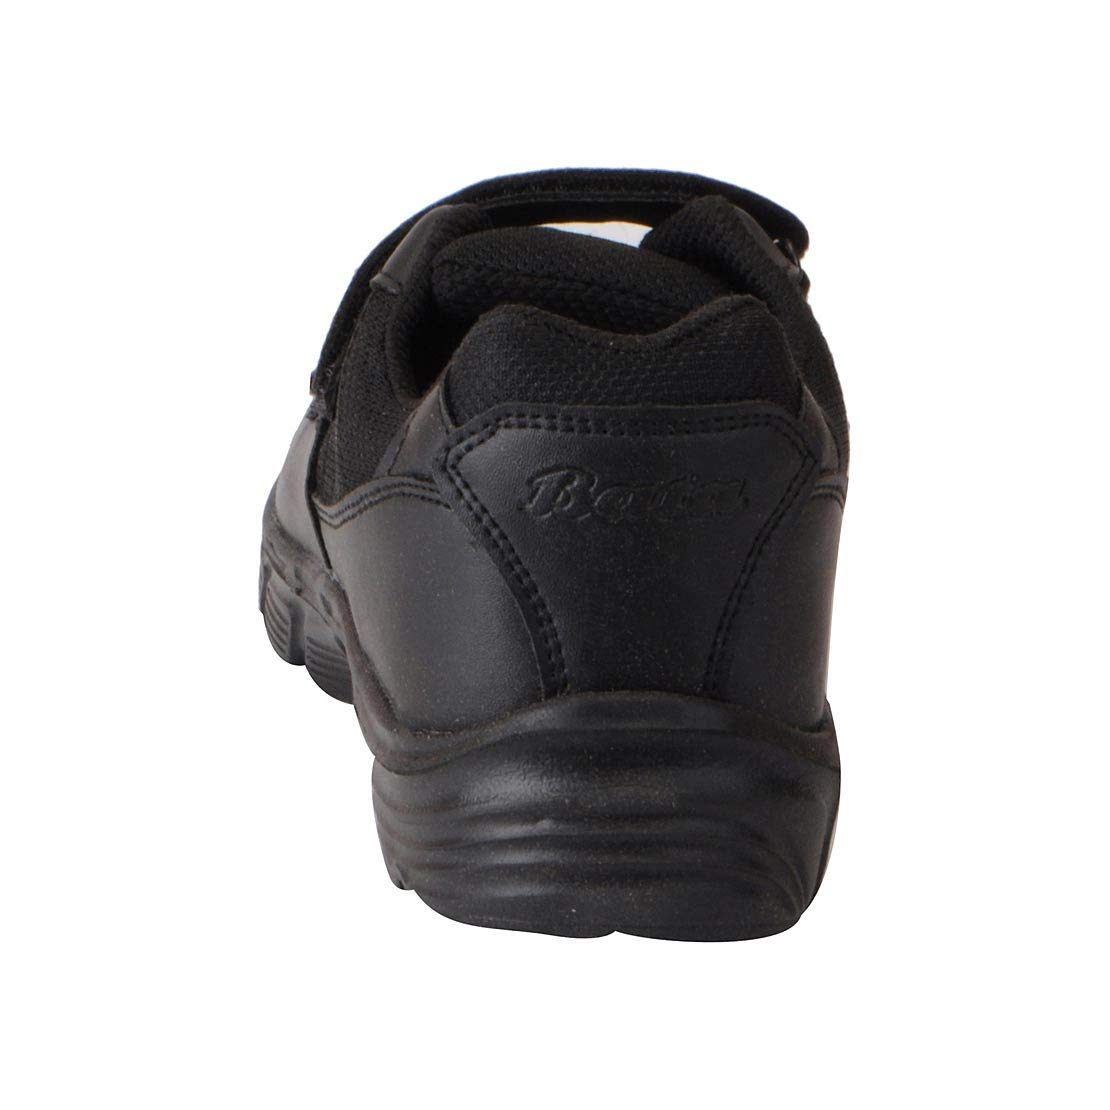 BATA Boys Black School Shoes- Buy